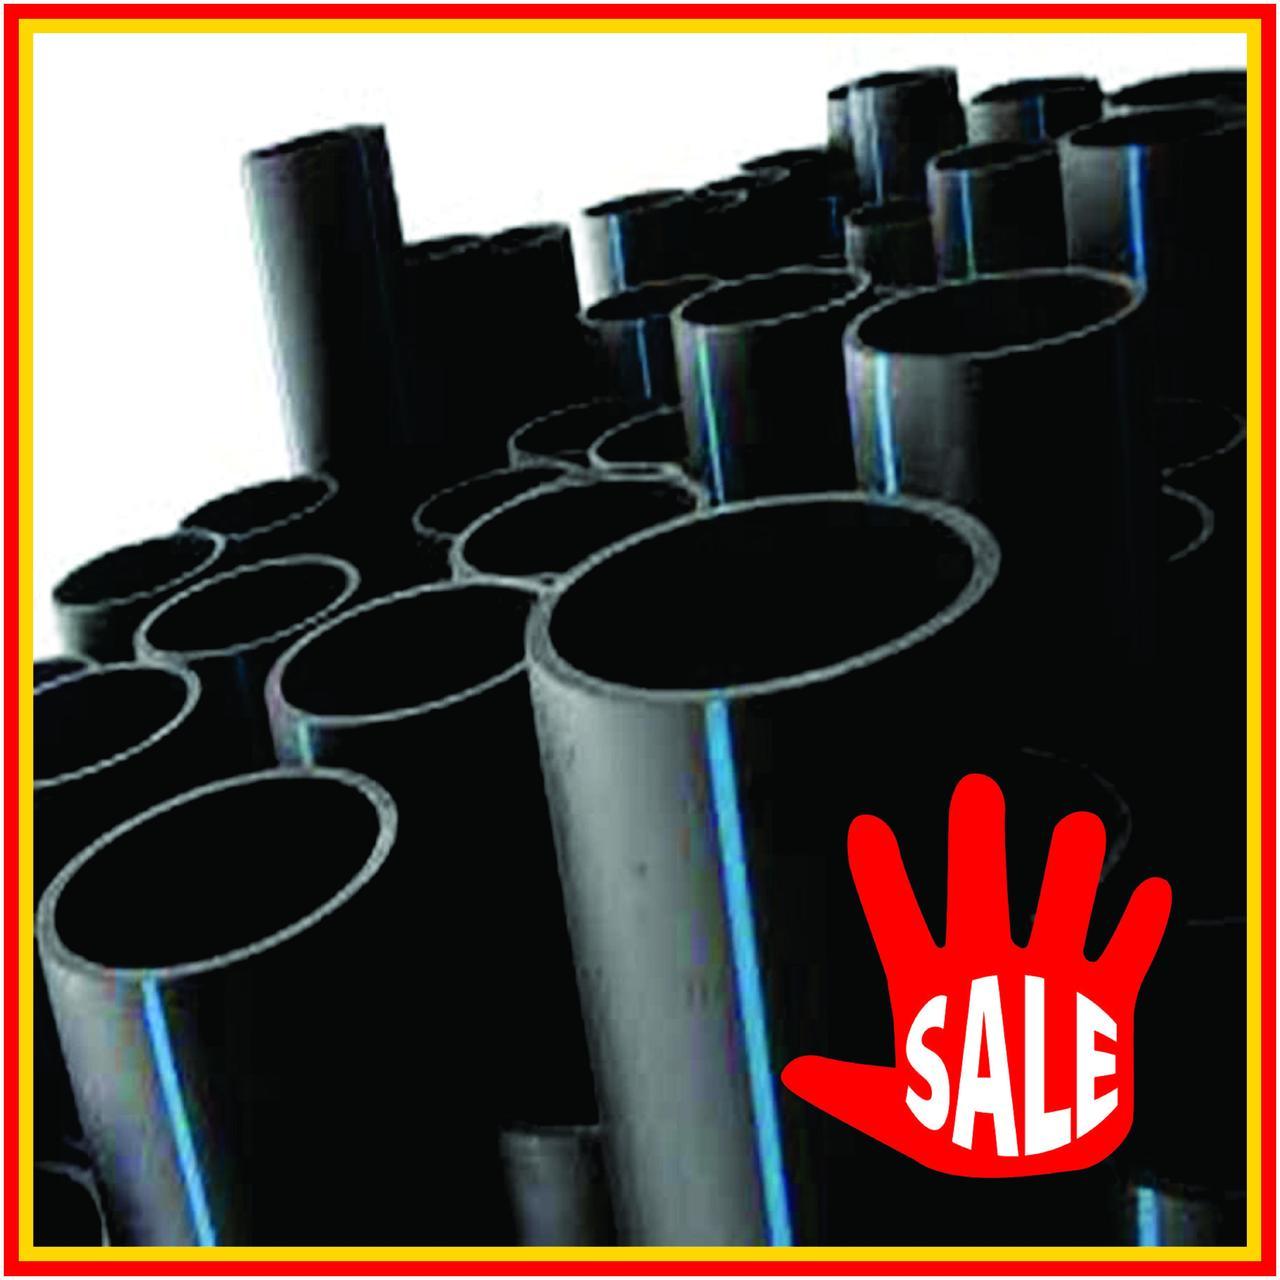 Трубы ПНД 125 мм для канализации